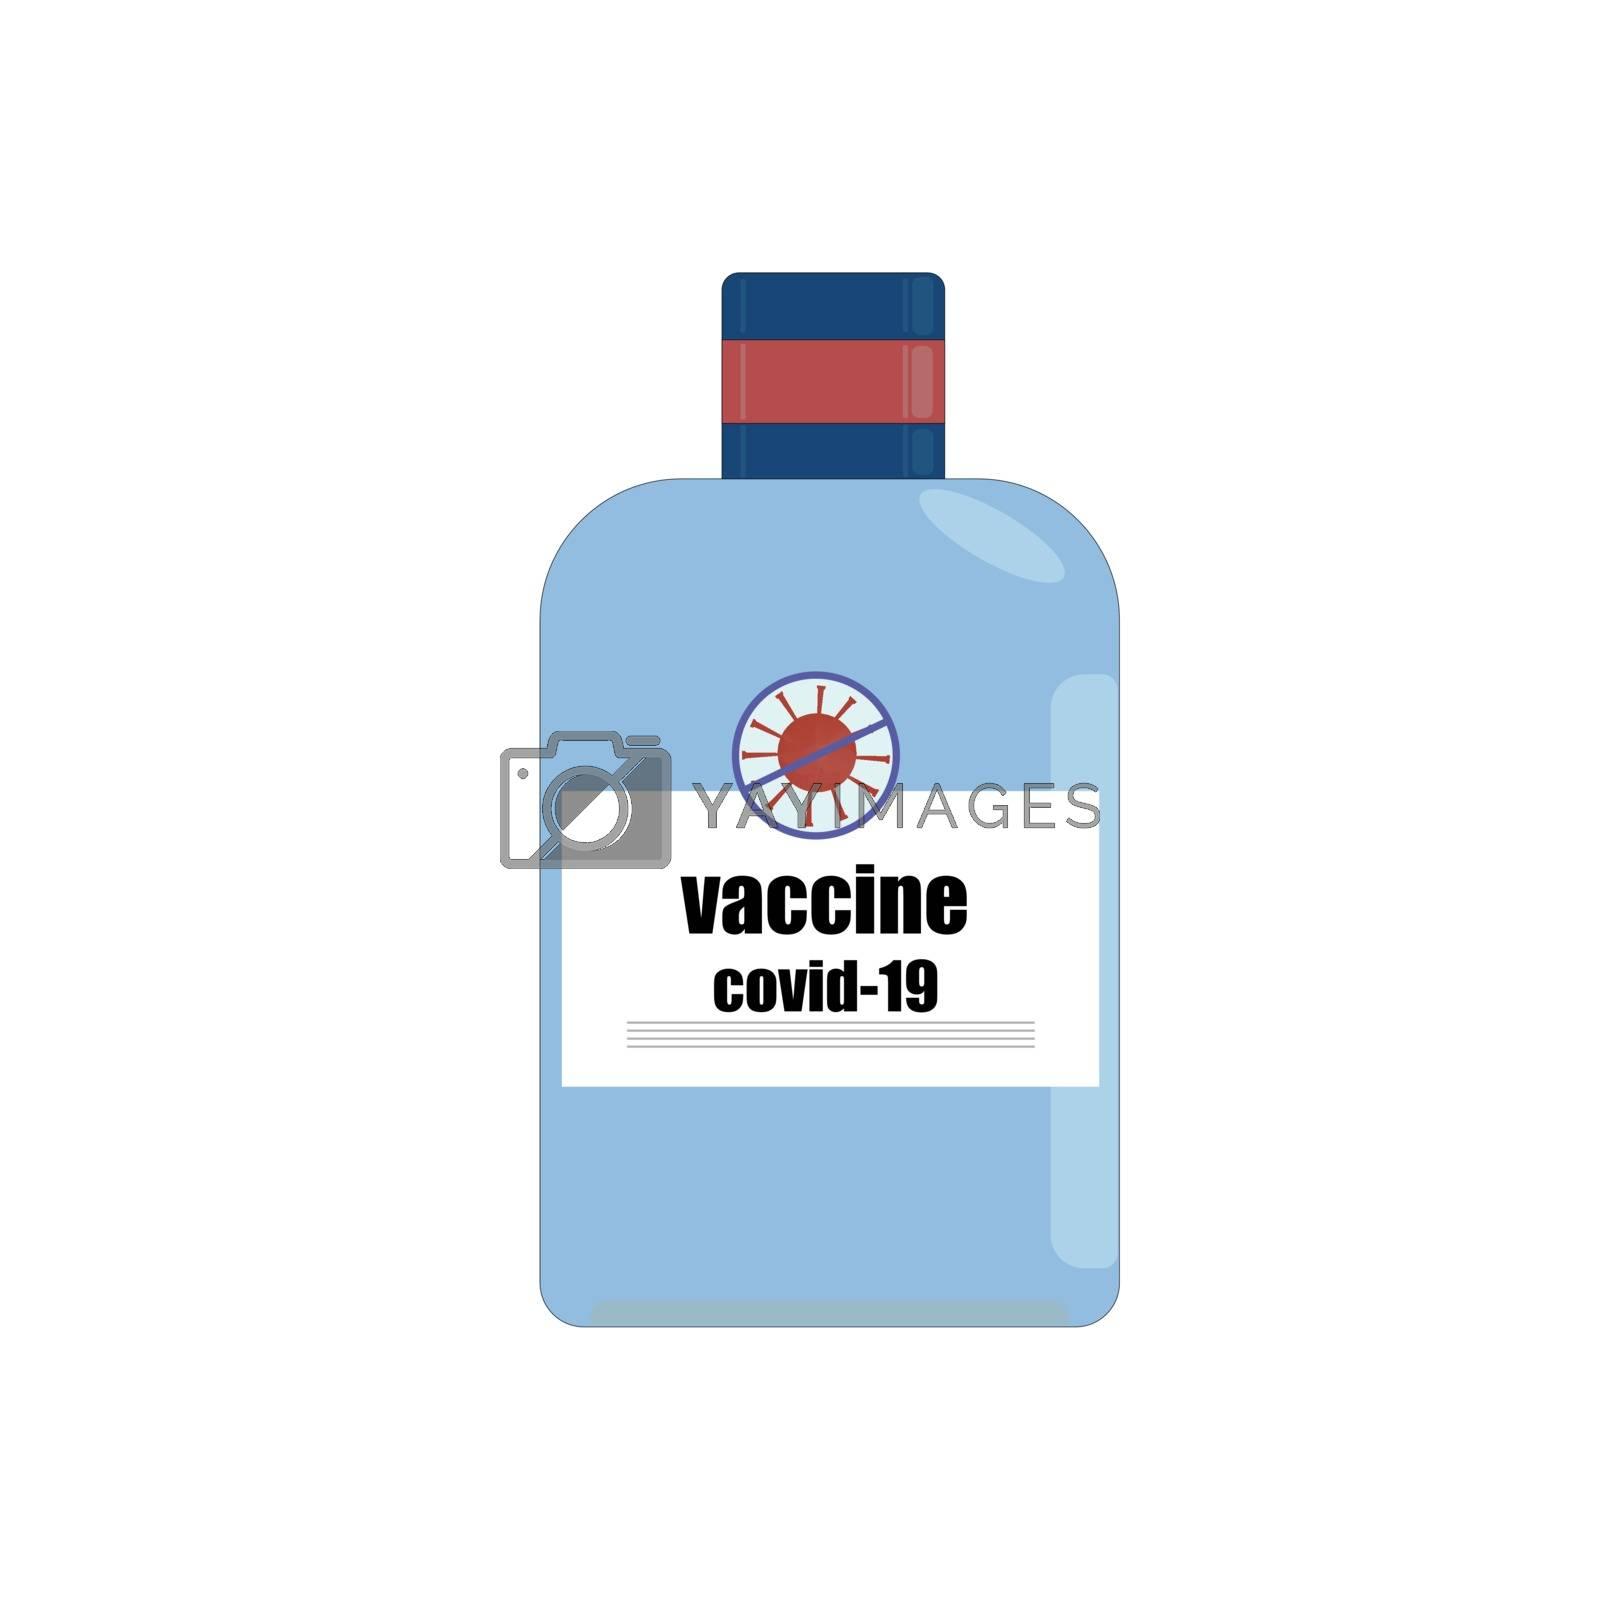 A jar of medicine. Covid-19 coronavirus vaccine. 2019 coronavirus vaccine.Vector illustration.